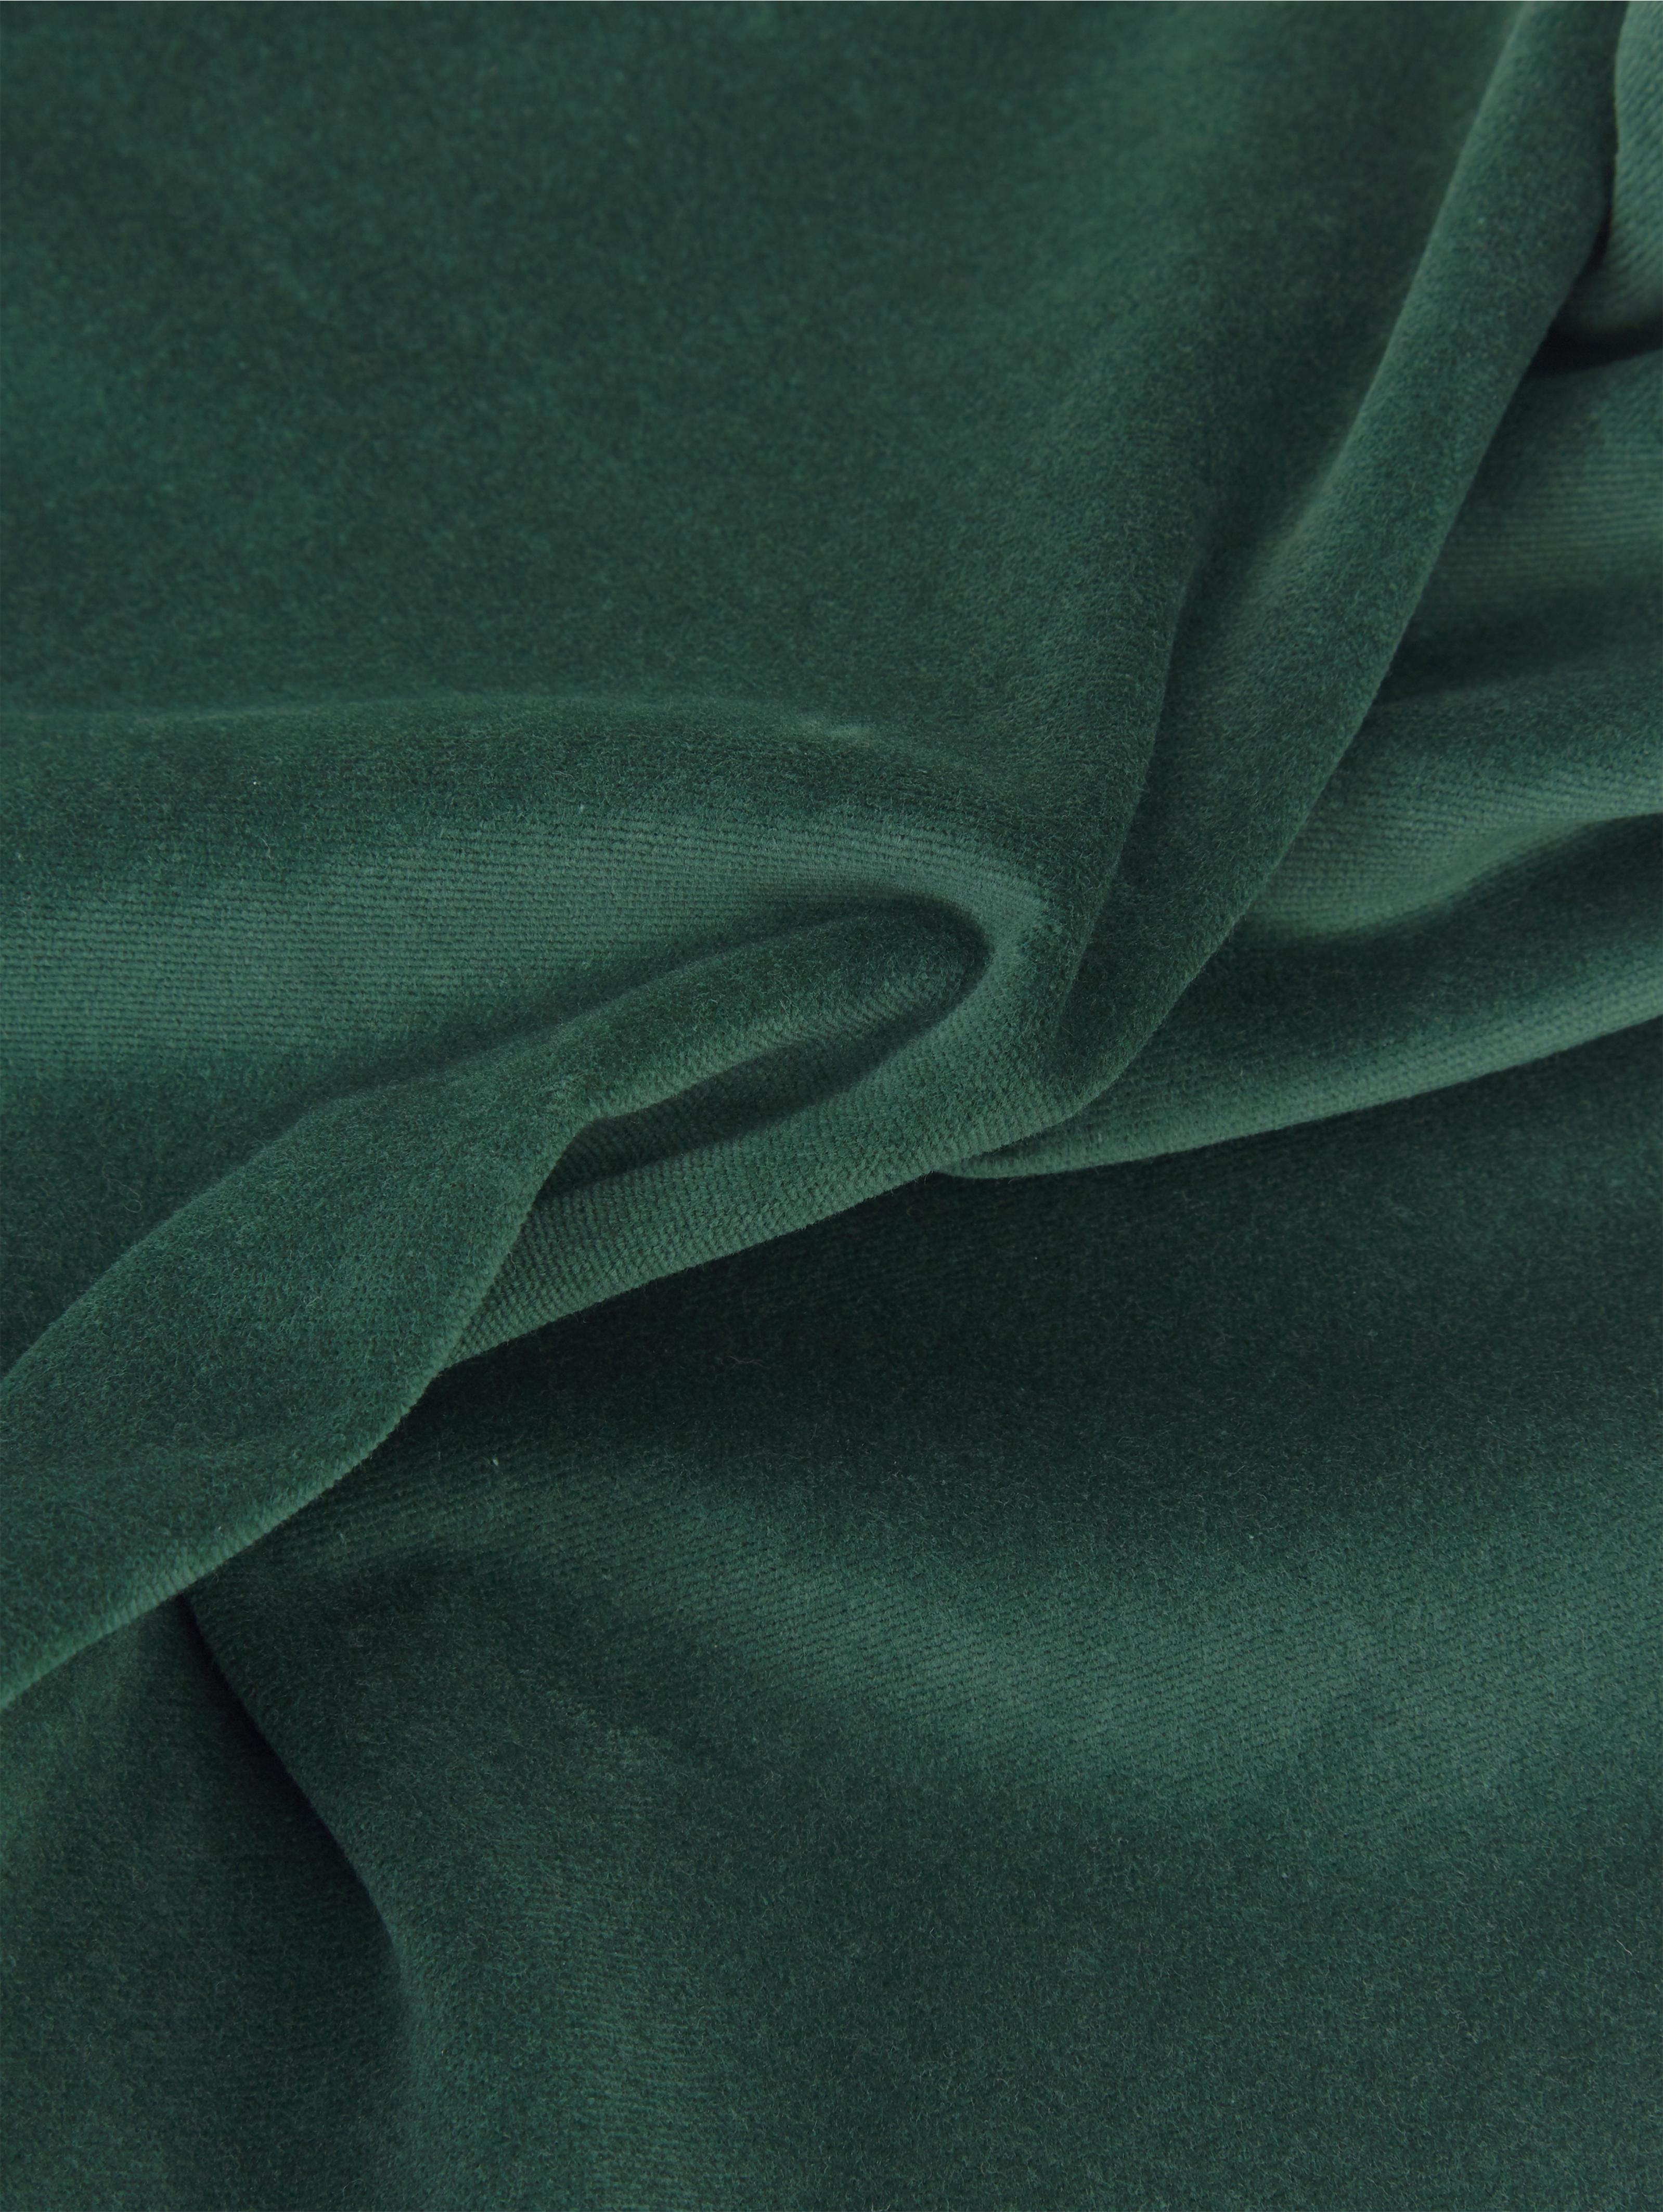 Jednobarevný sametový povlak na polštář Dana, Smaragdově zelená